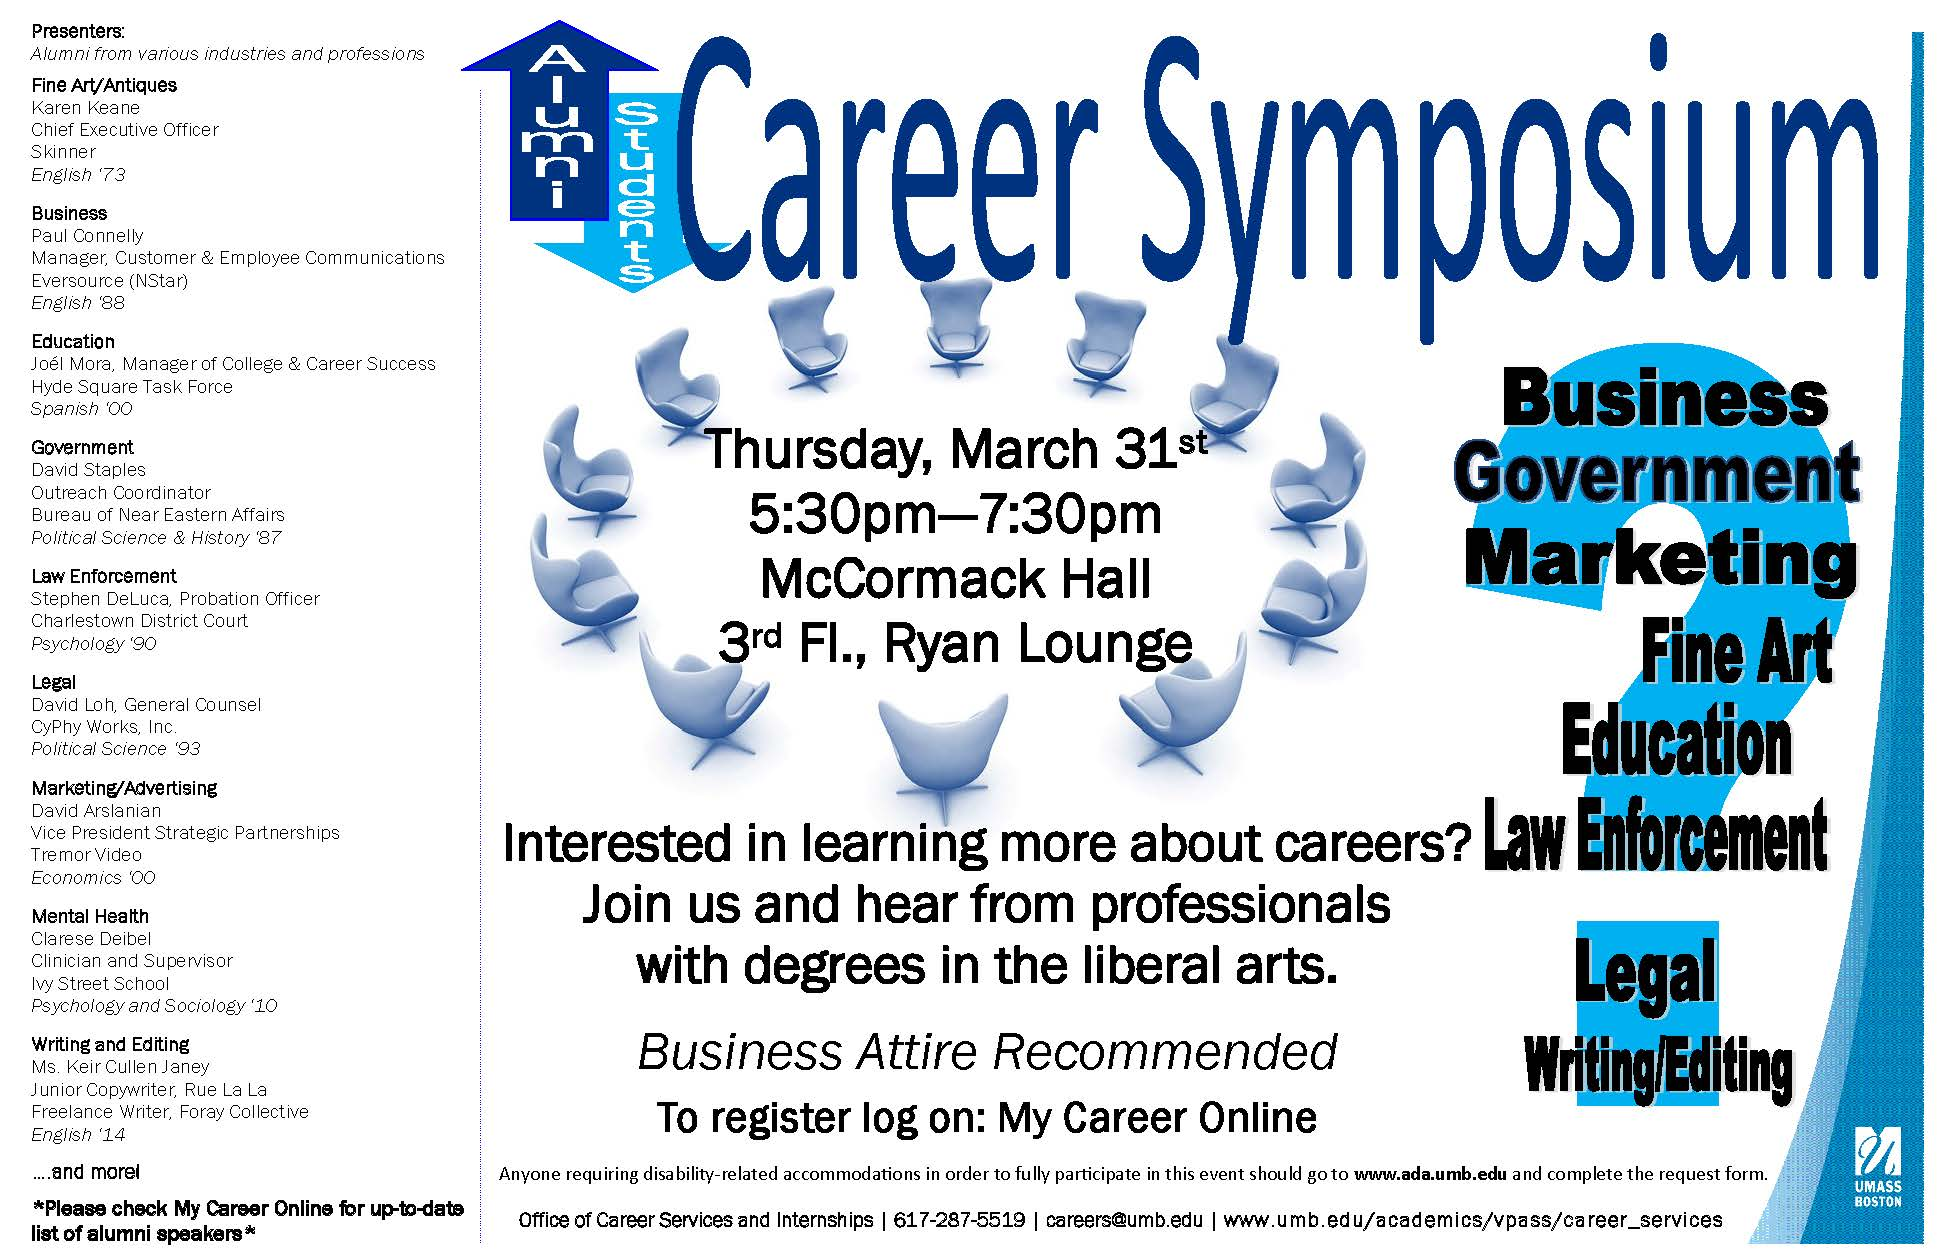 career symposium thursday st college of management career symposium poster 2016